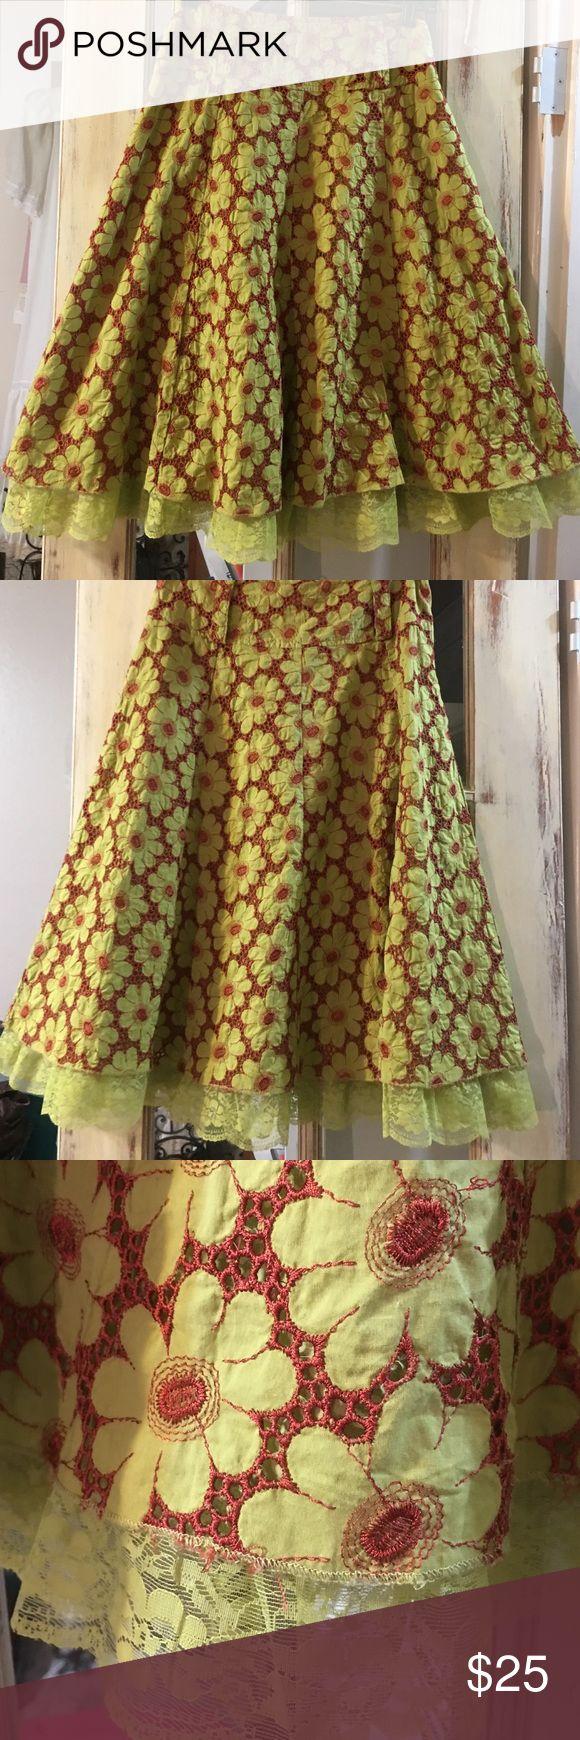 "Aryeh lace hem skirt 26"" long rust & lime skirt. Side zip 13"" waist band. Lace hem aryeh Skirts Midi"